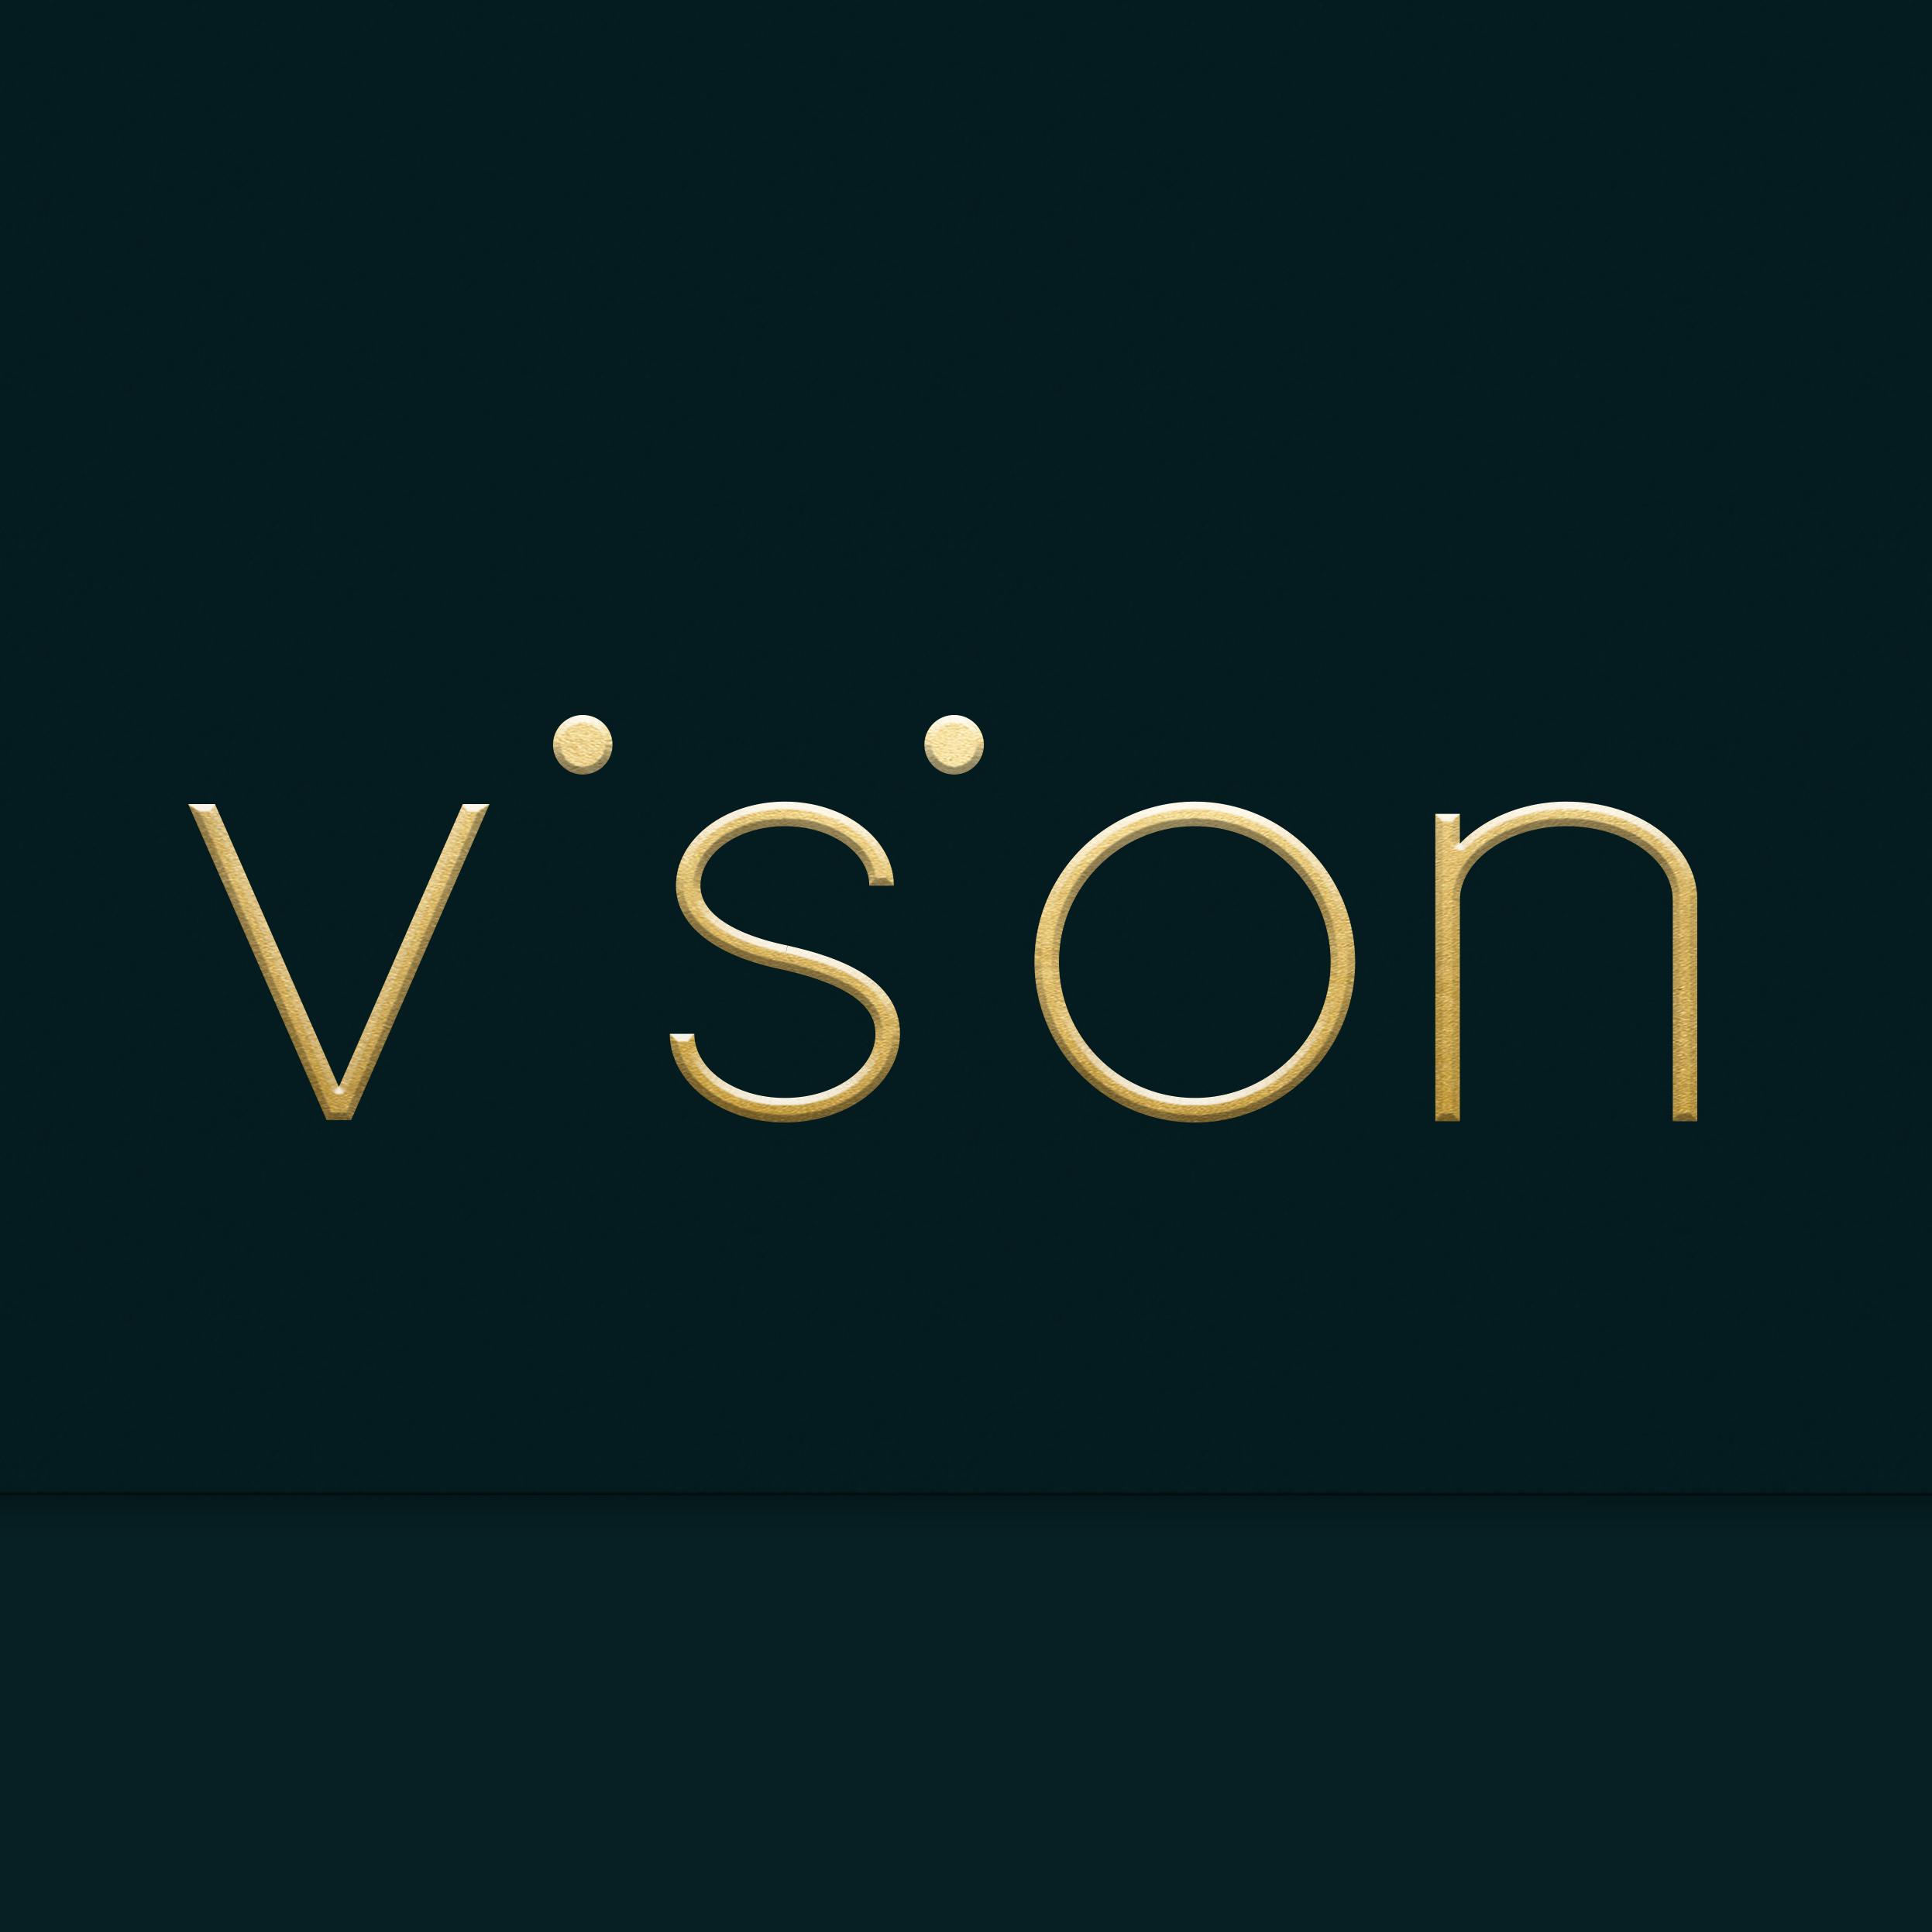 VISION LOGO final_dark teal.jpg